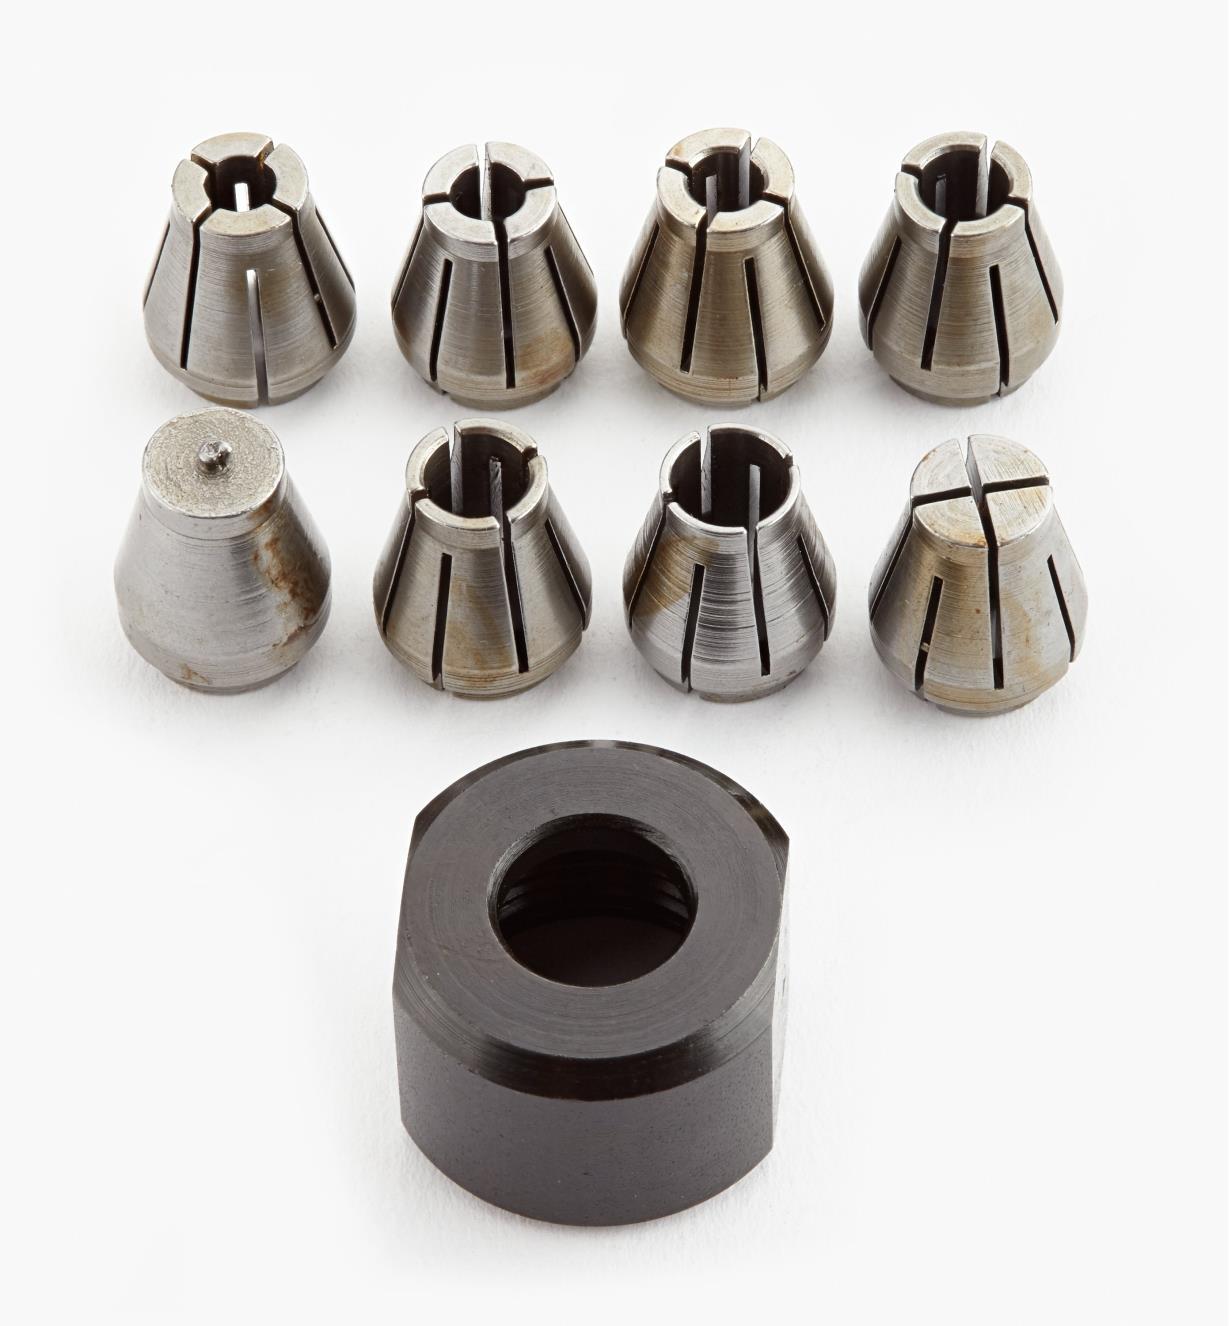 03J7011 - 9-Piece Collet/Nut Set